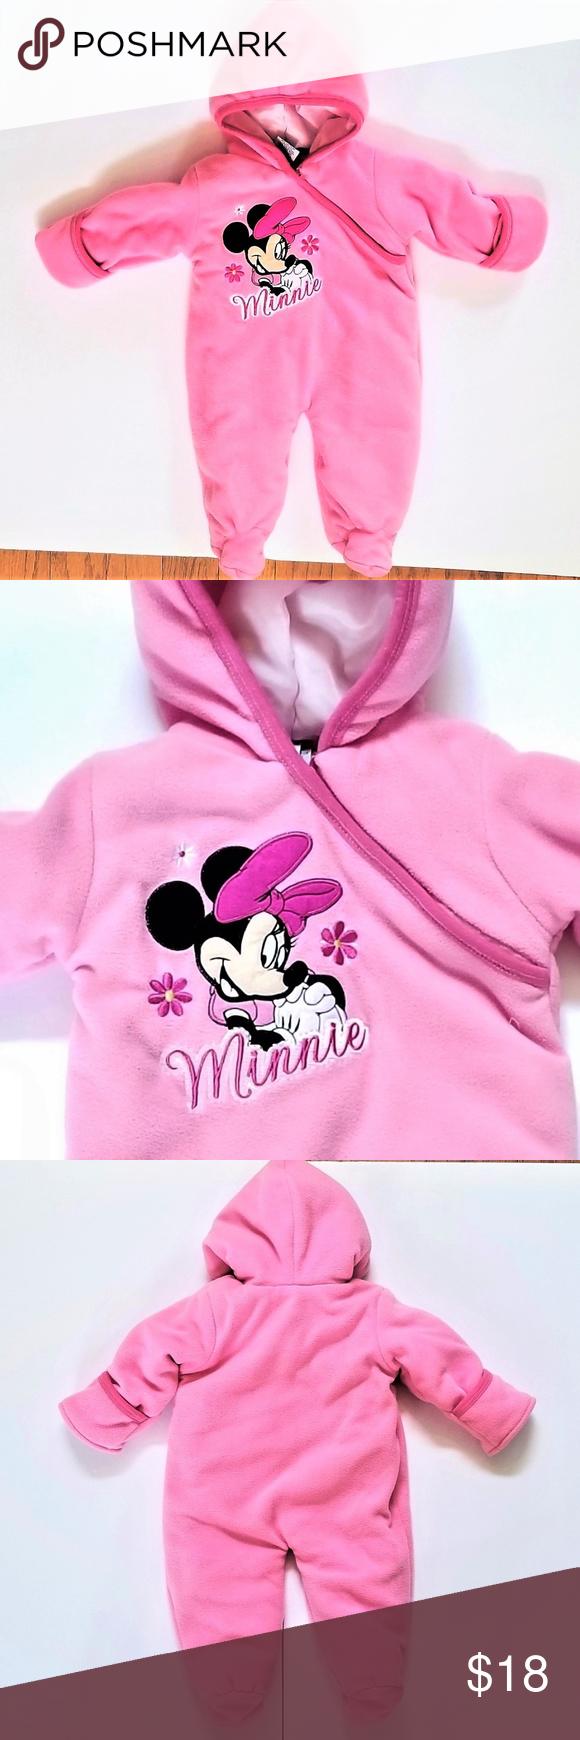 Disney Pink Snowsuit Girls 36m Like New One piece.. Hands